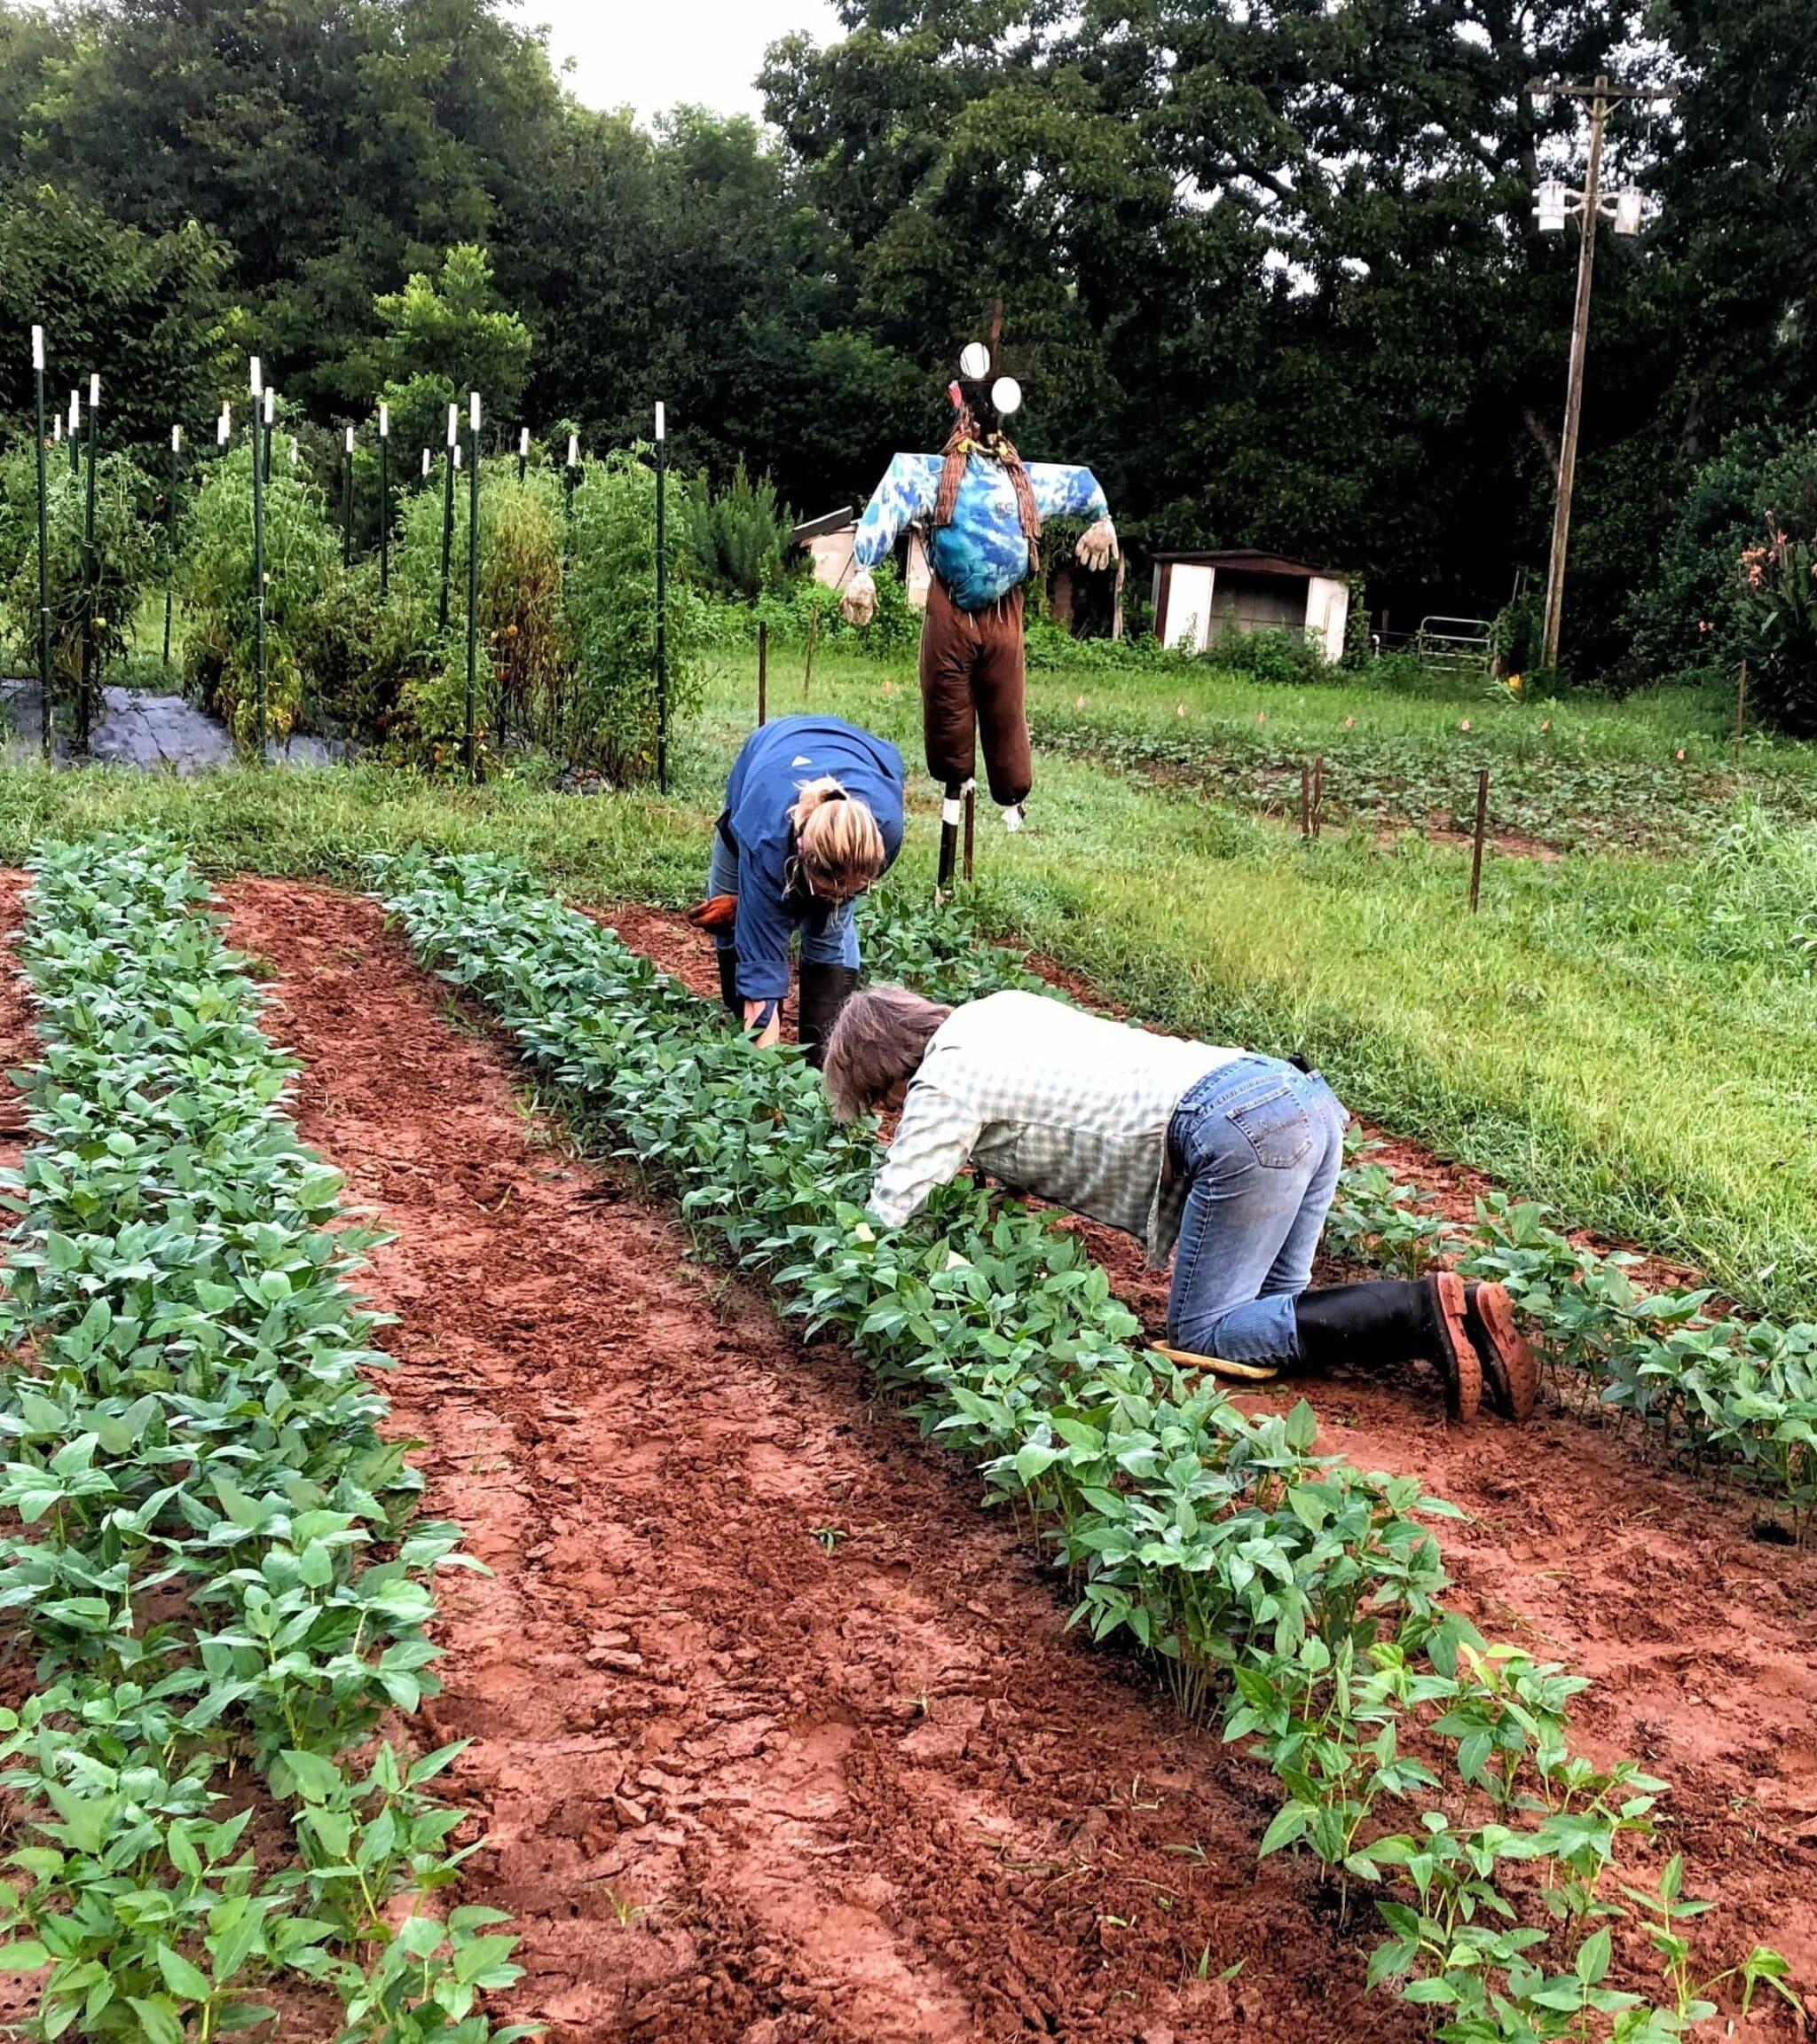 Two people weeding rows of peas